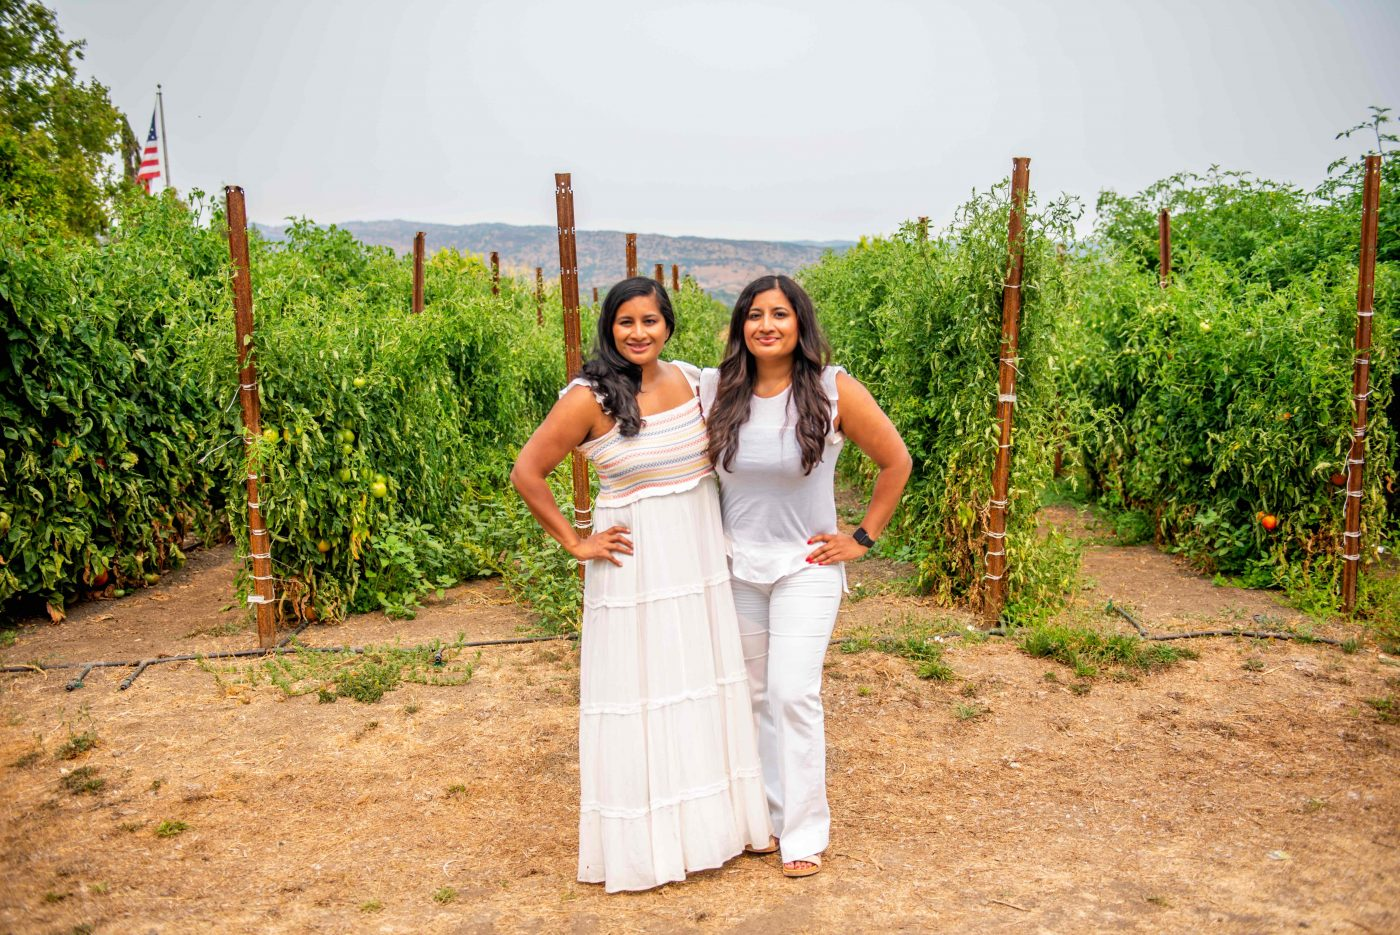 2 Women at Trefethen